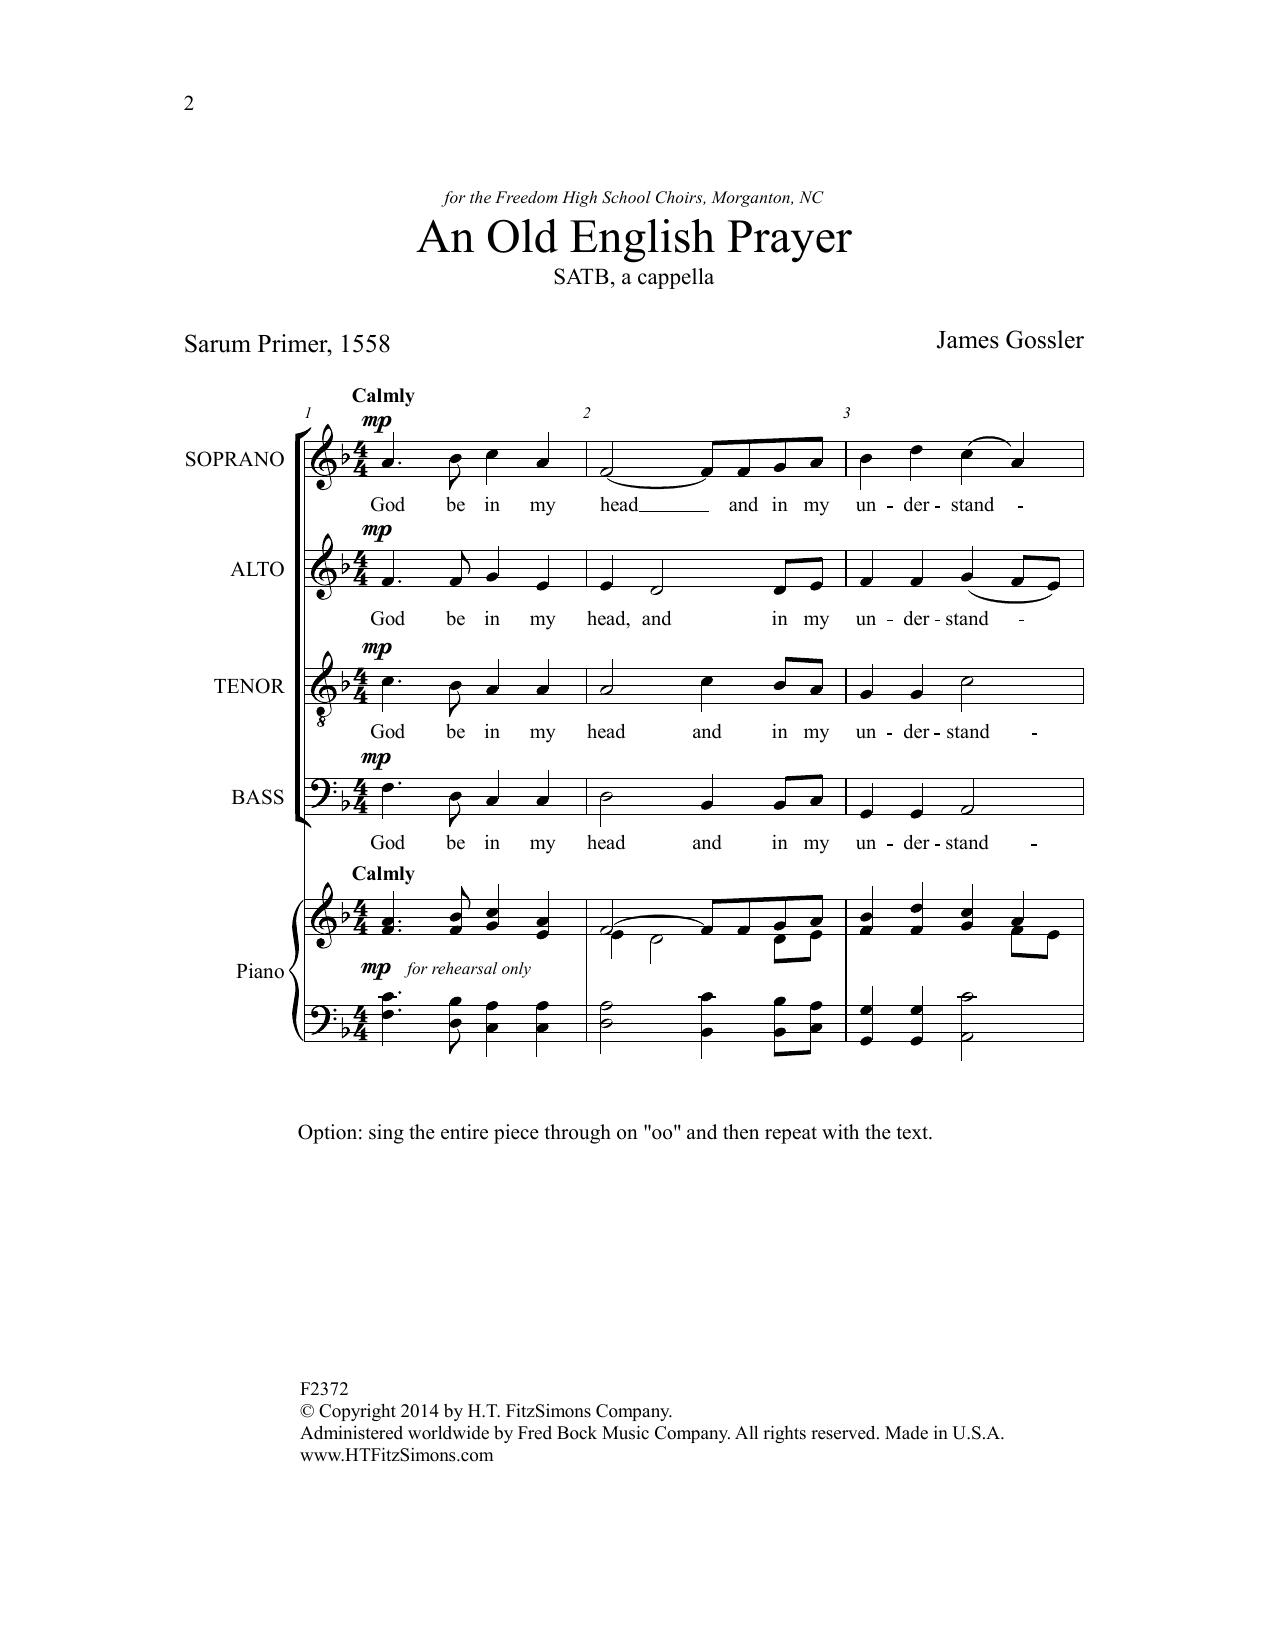 An Old English Prayer Sheet Music